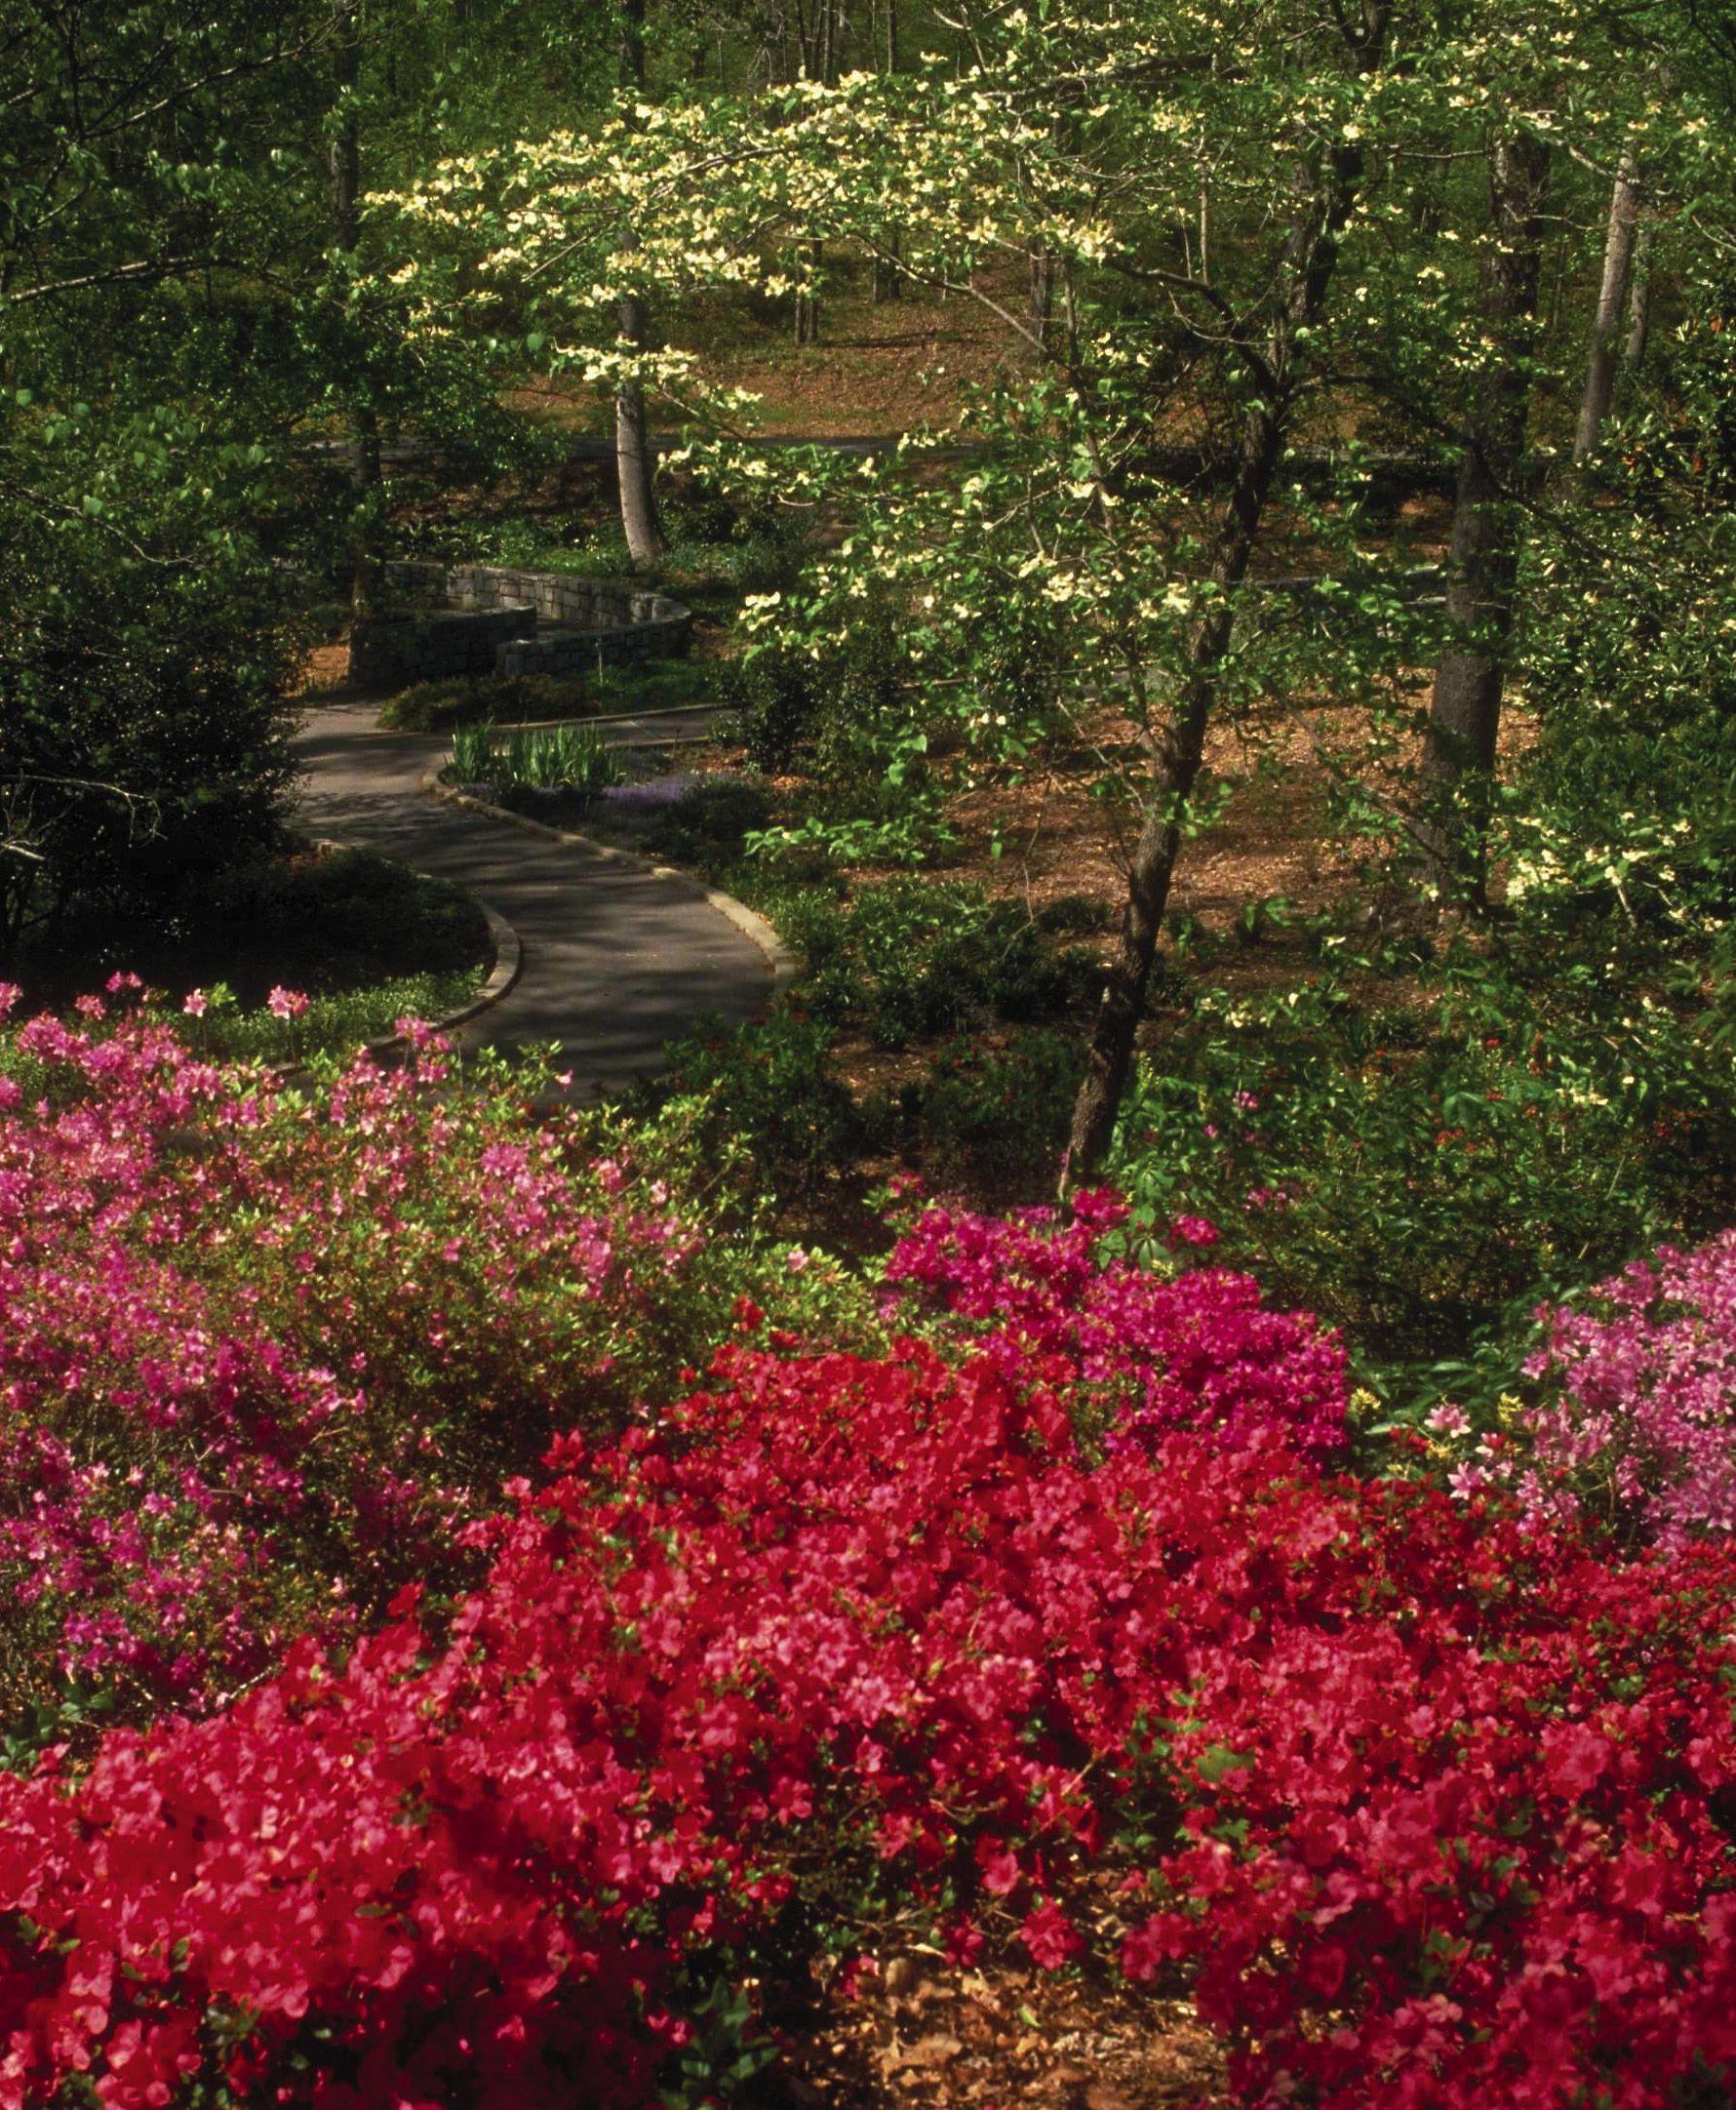 georgia gardens | georgia s gem the state botanical garden in athens ...